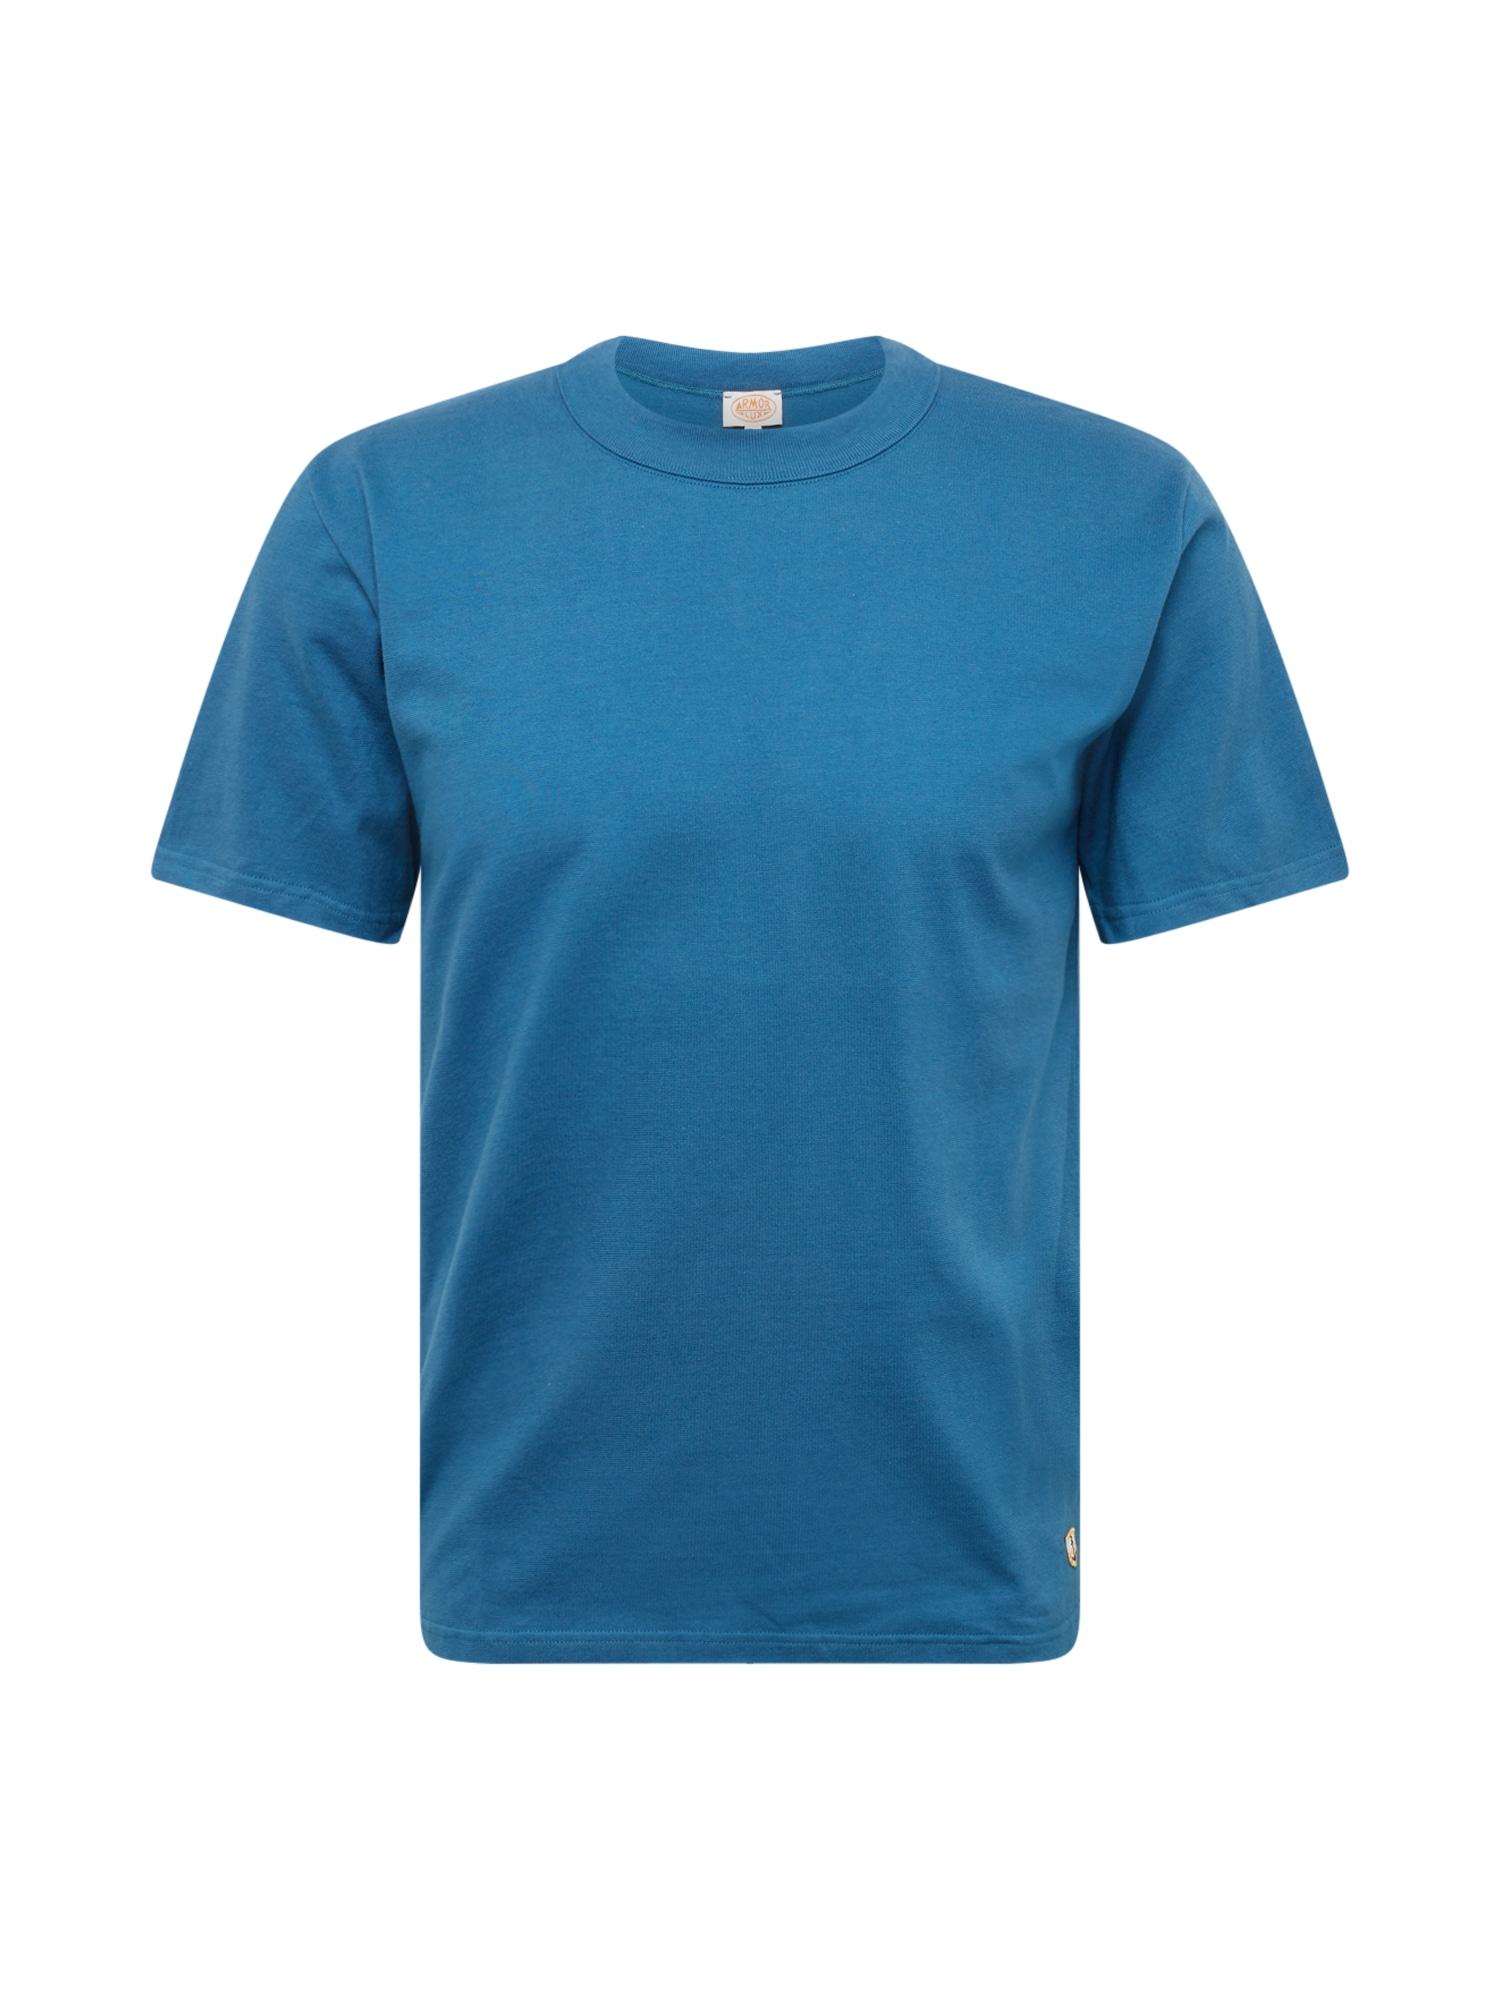 Tričko Callac modrá Armor Lux